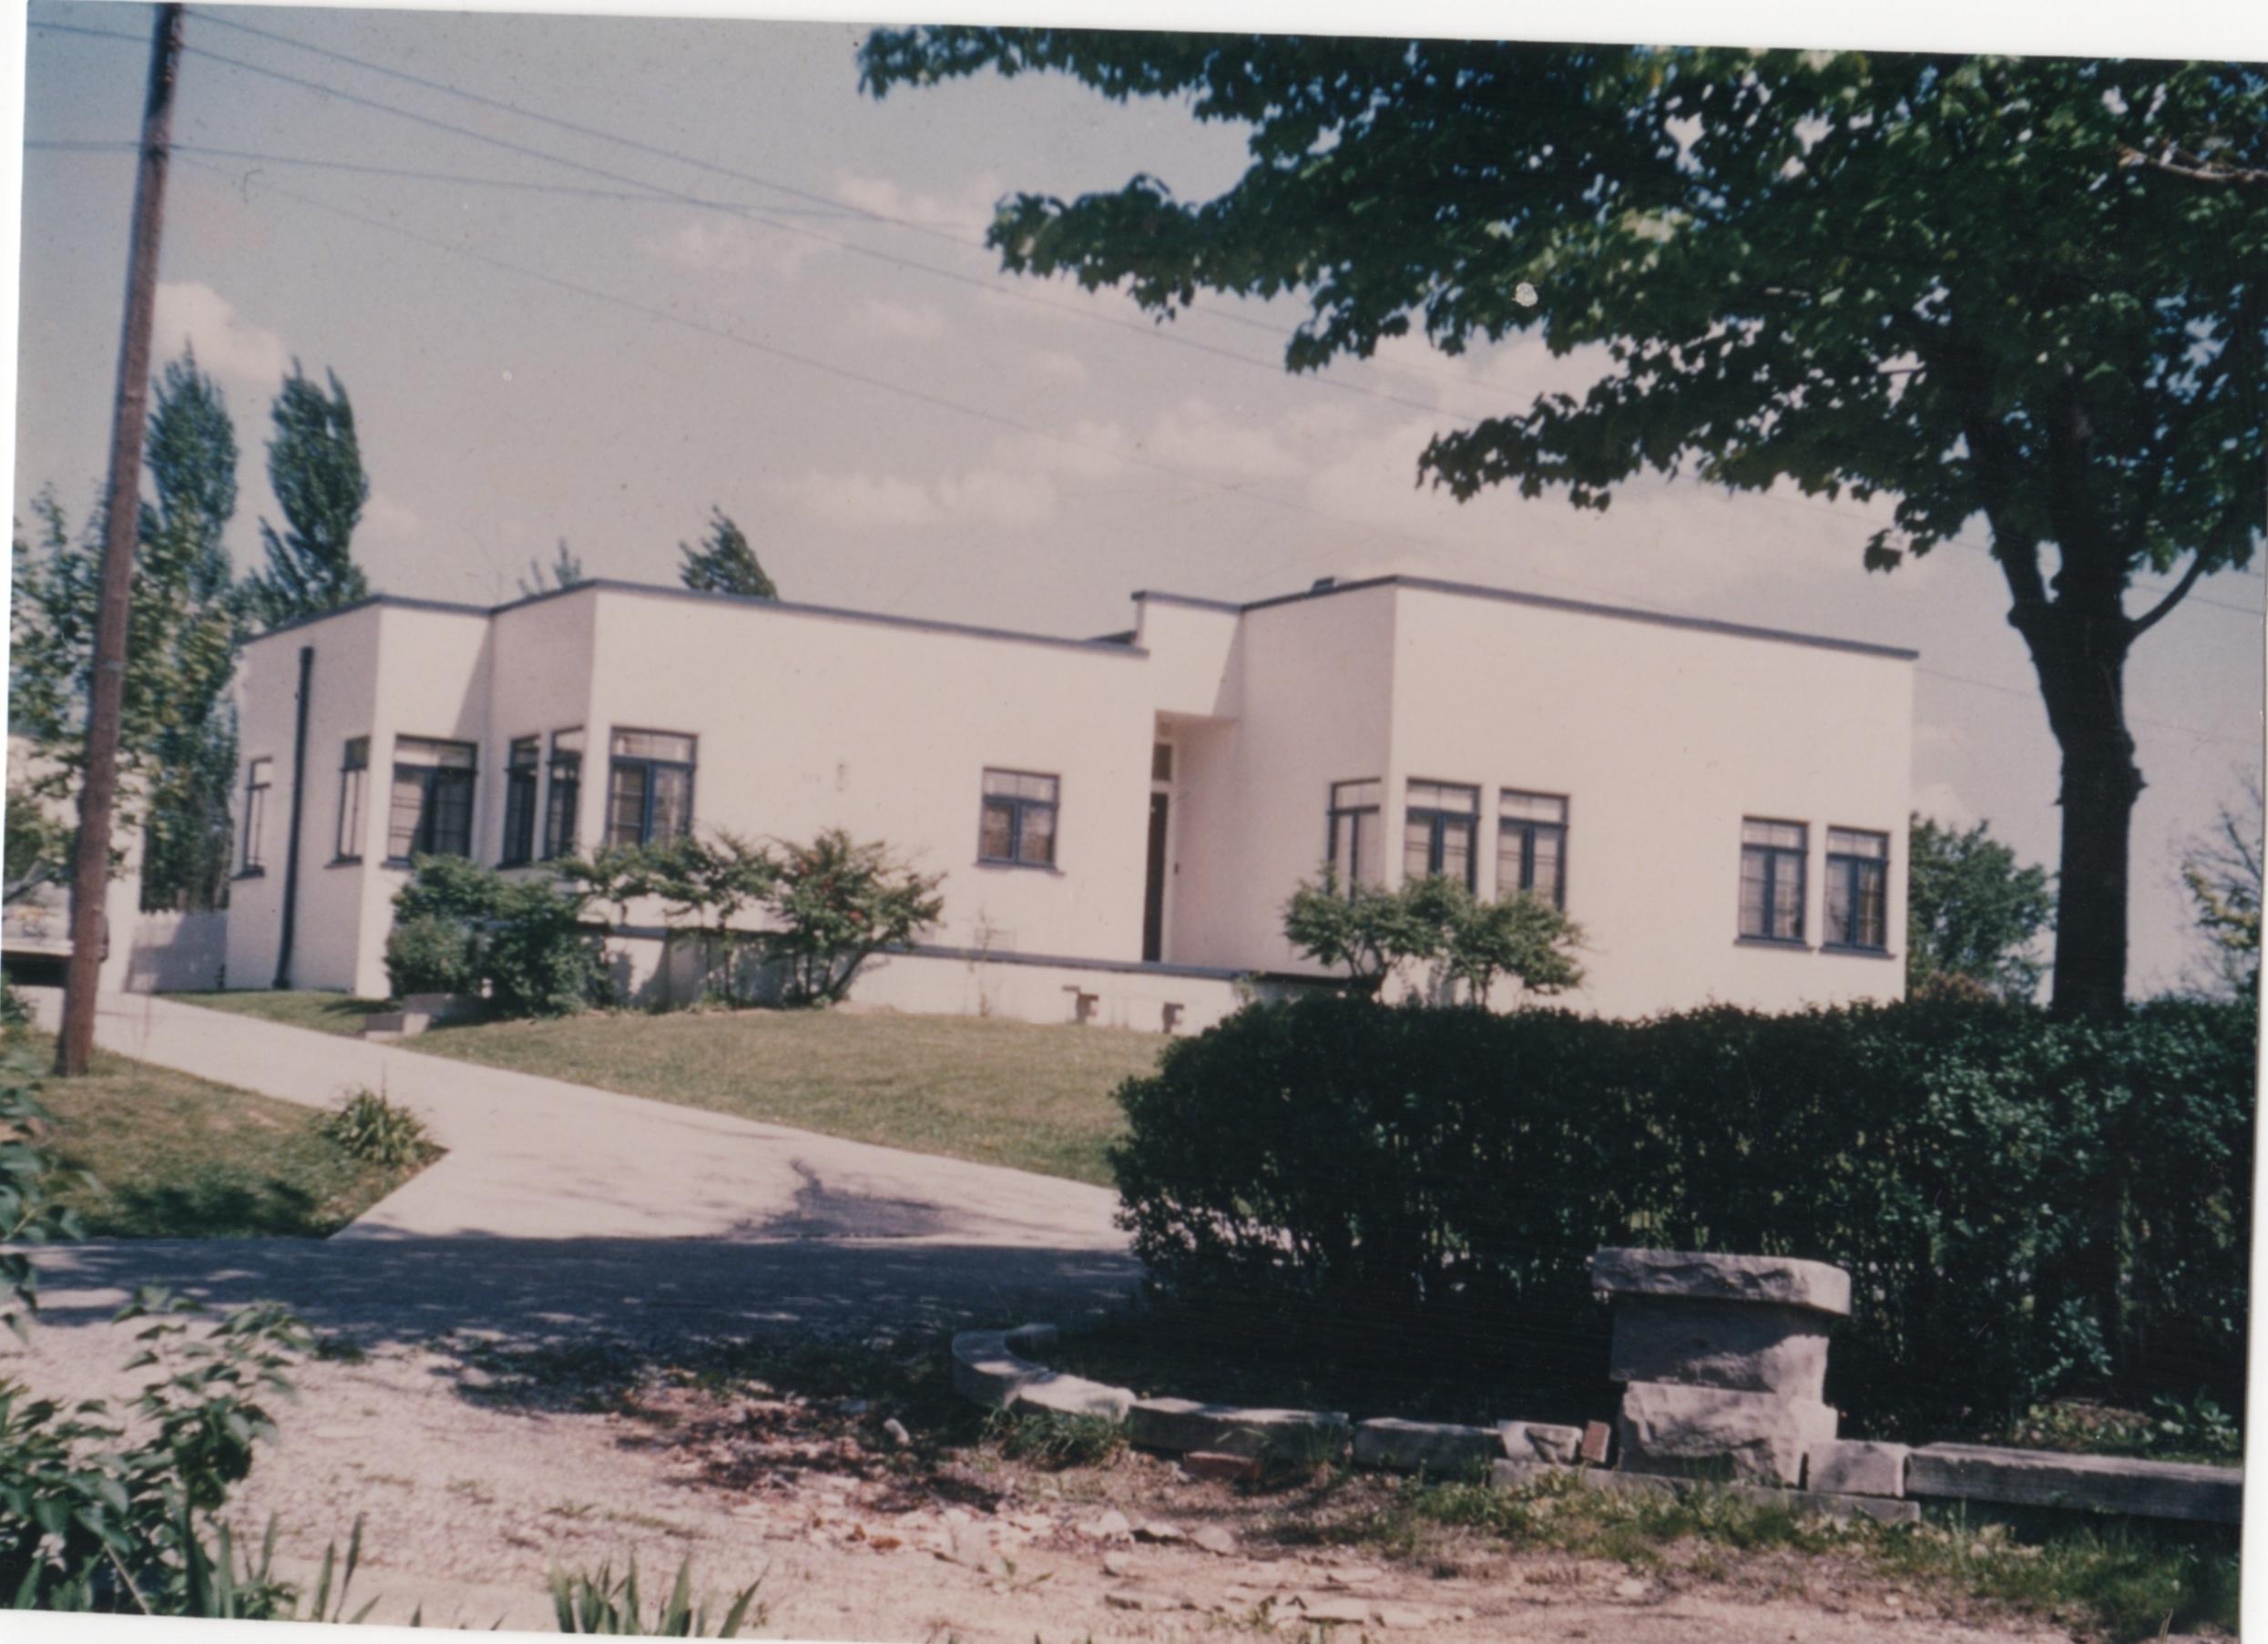 Arbutus House - 1950's.jpeg